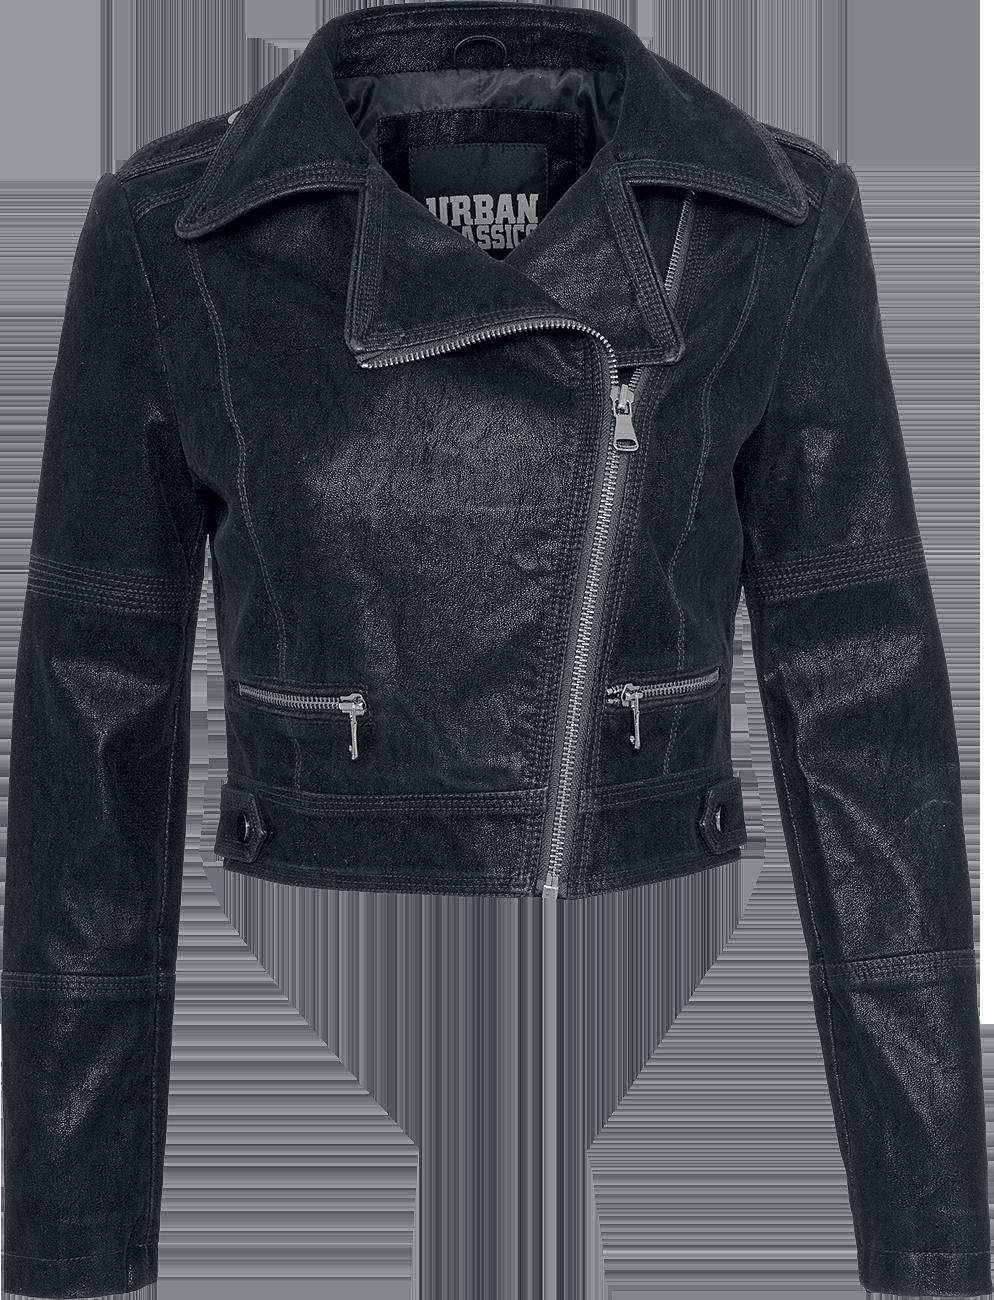 Urban Classics Ladies Short Biker Jacket Kurtka z ekoskóry damska czarny